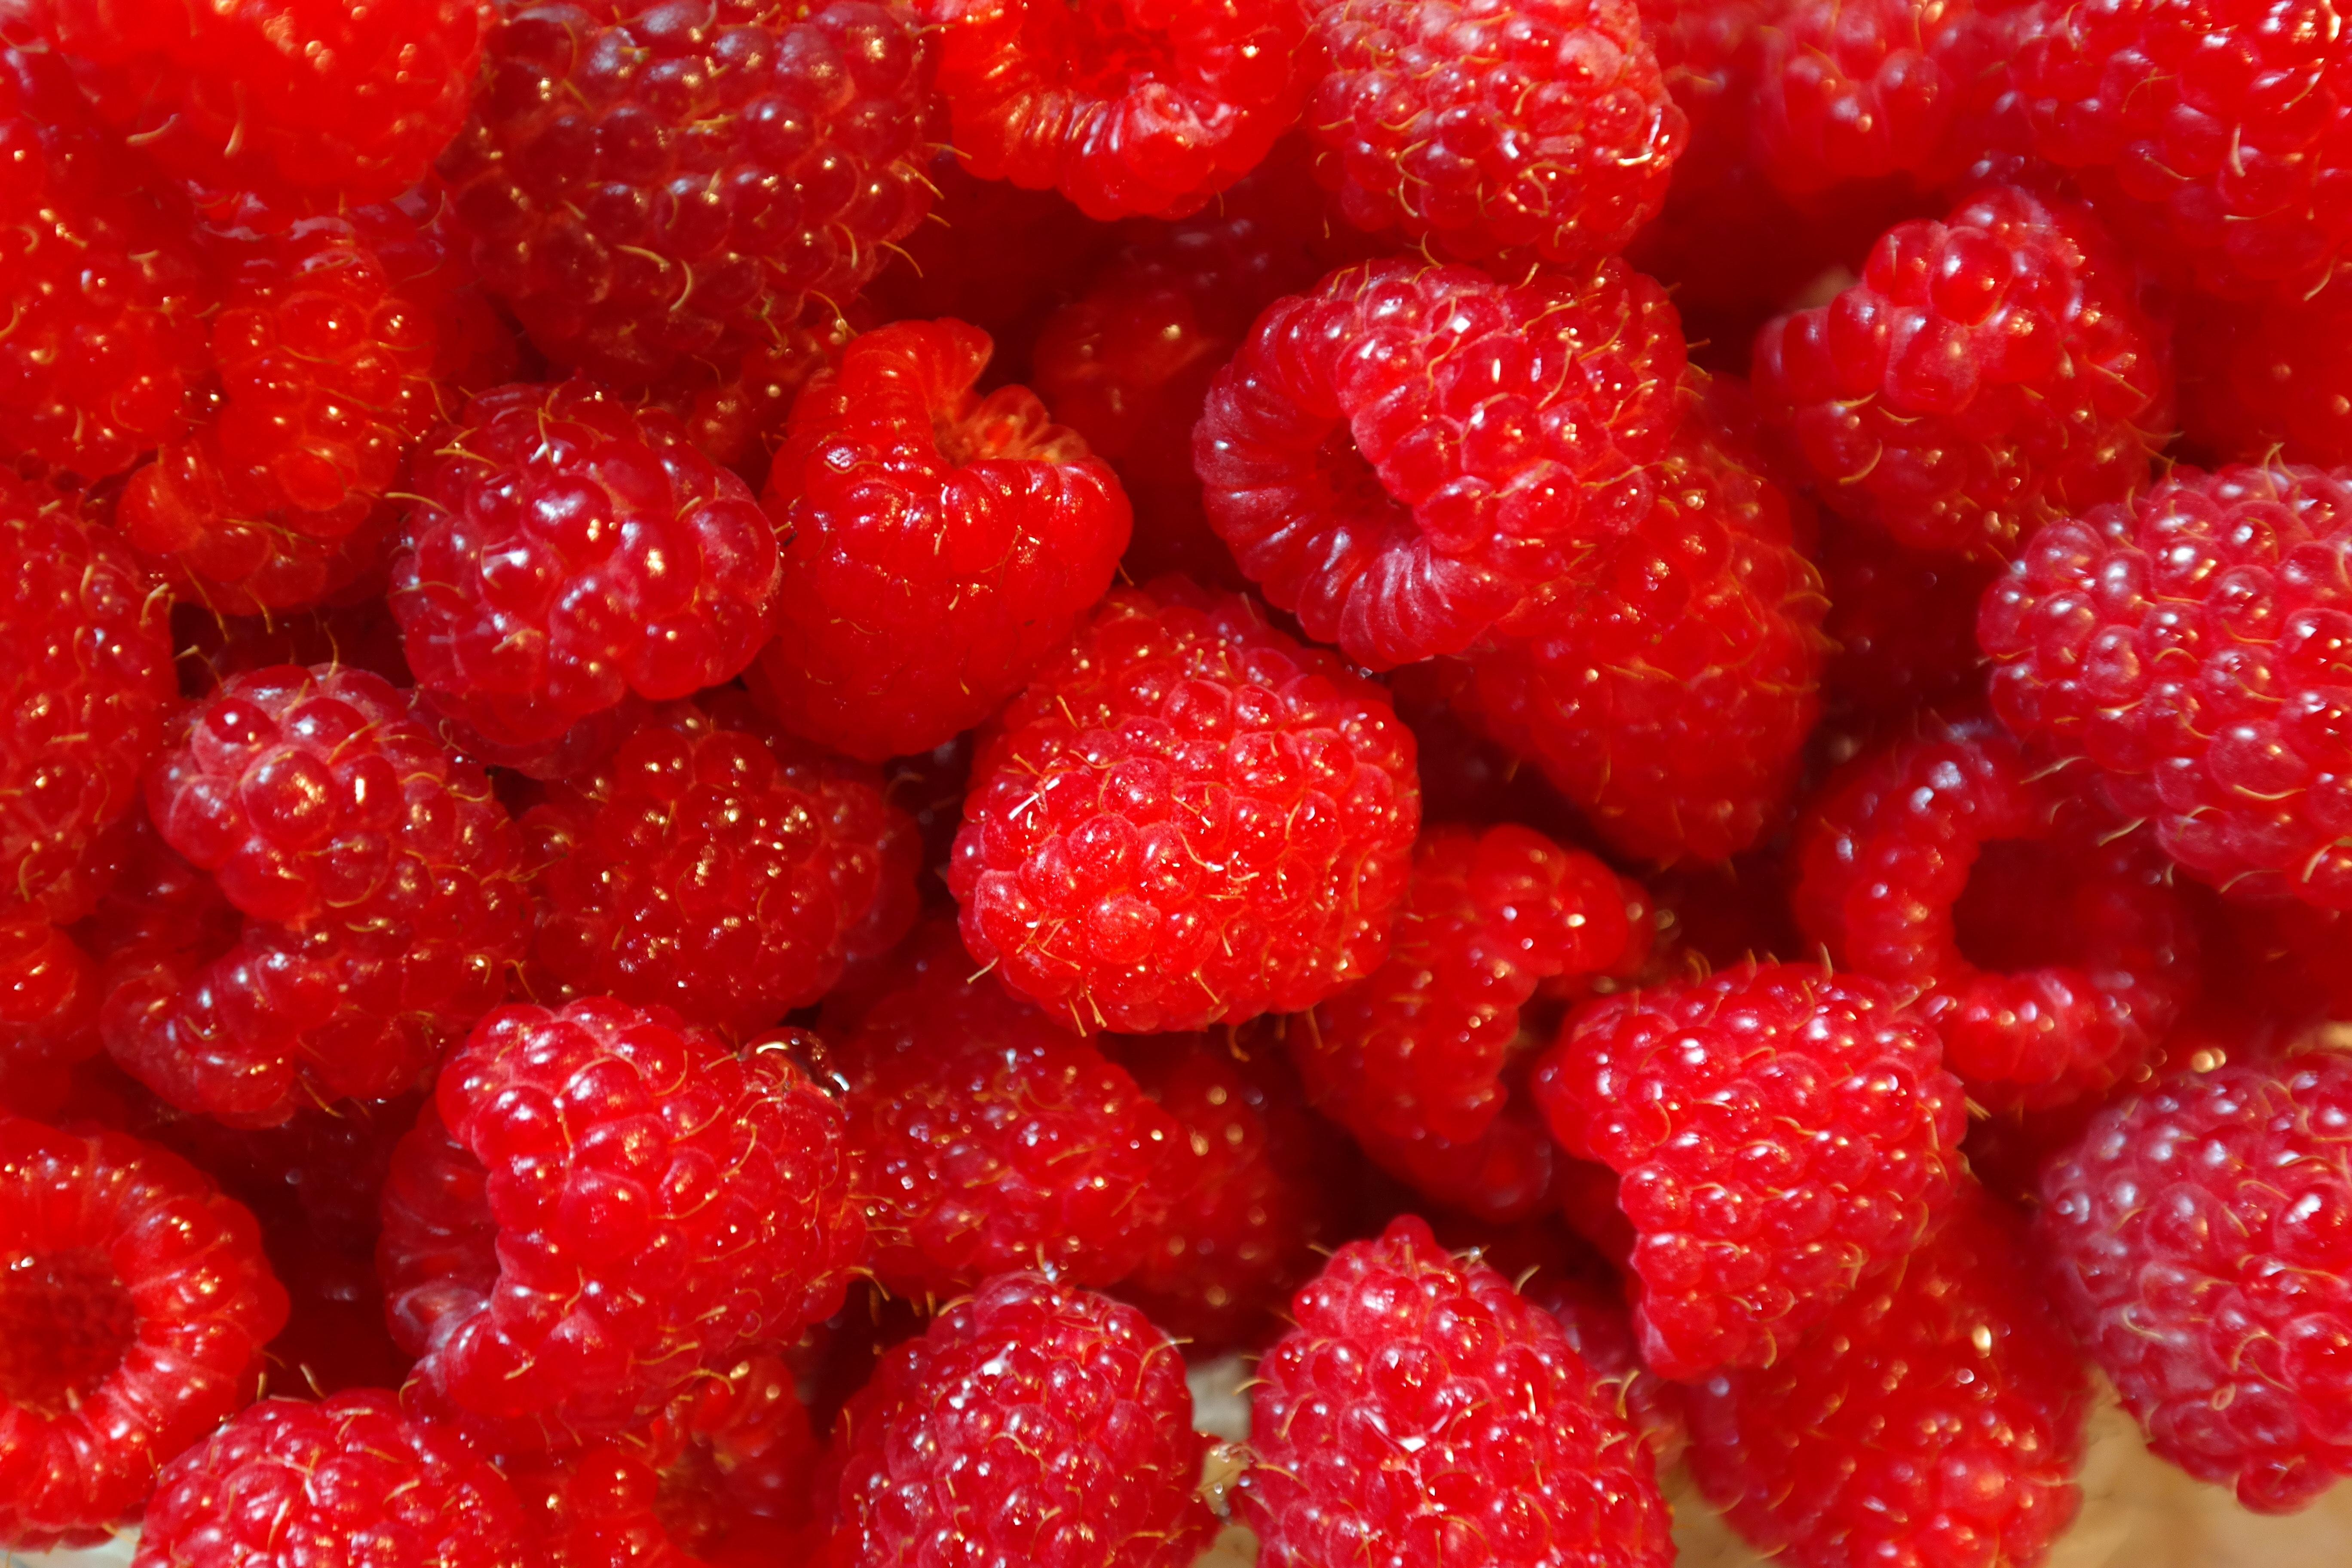 Red strawberry photo